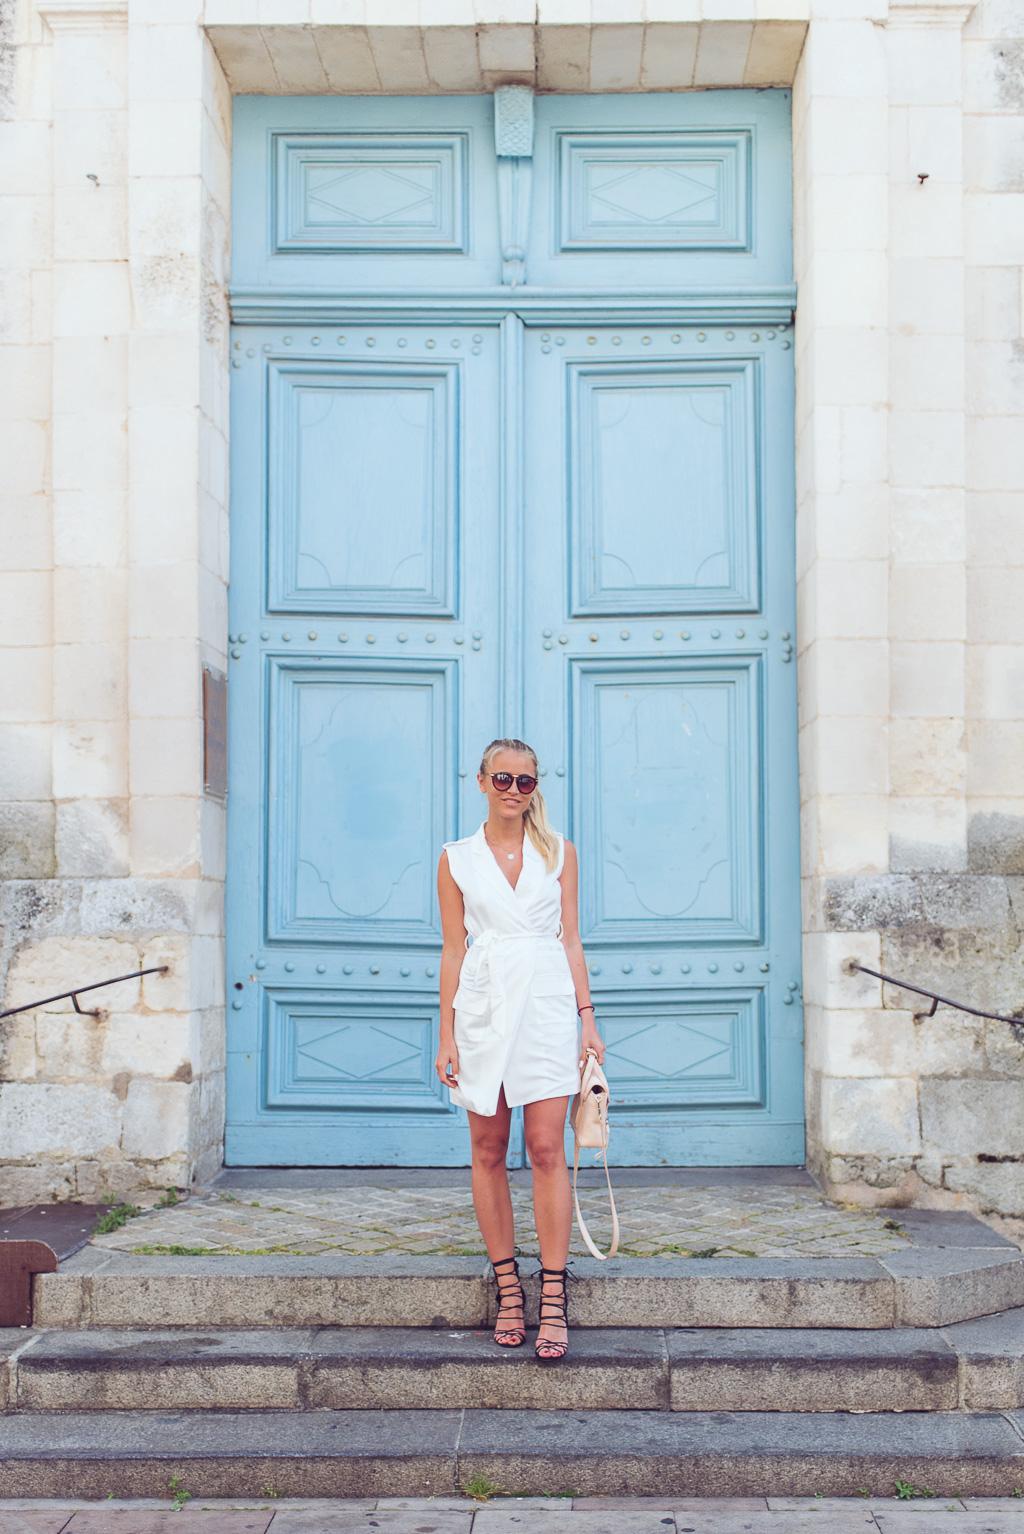 janni-deler-white-dress-victoriafornellyDSC_6407